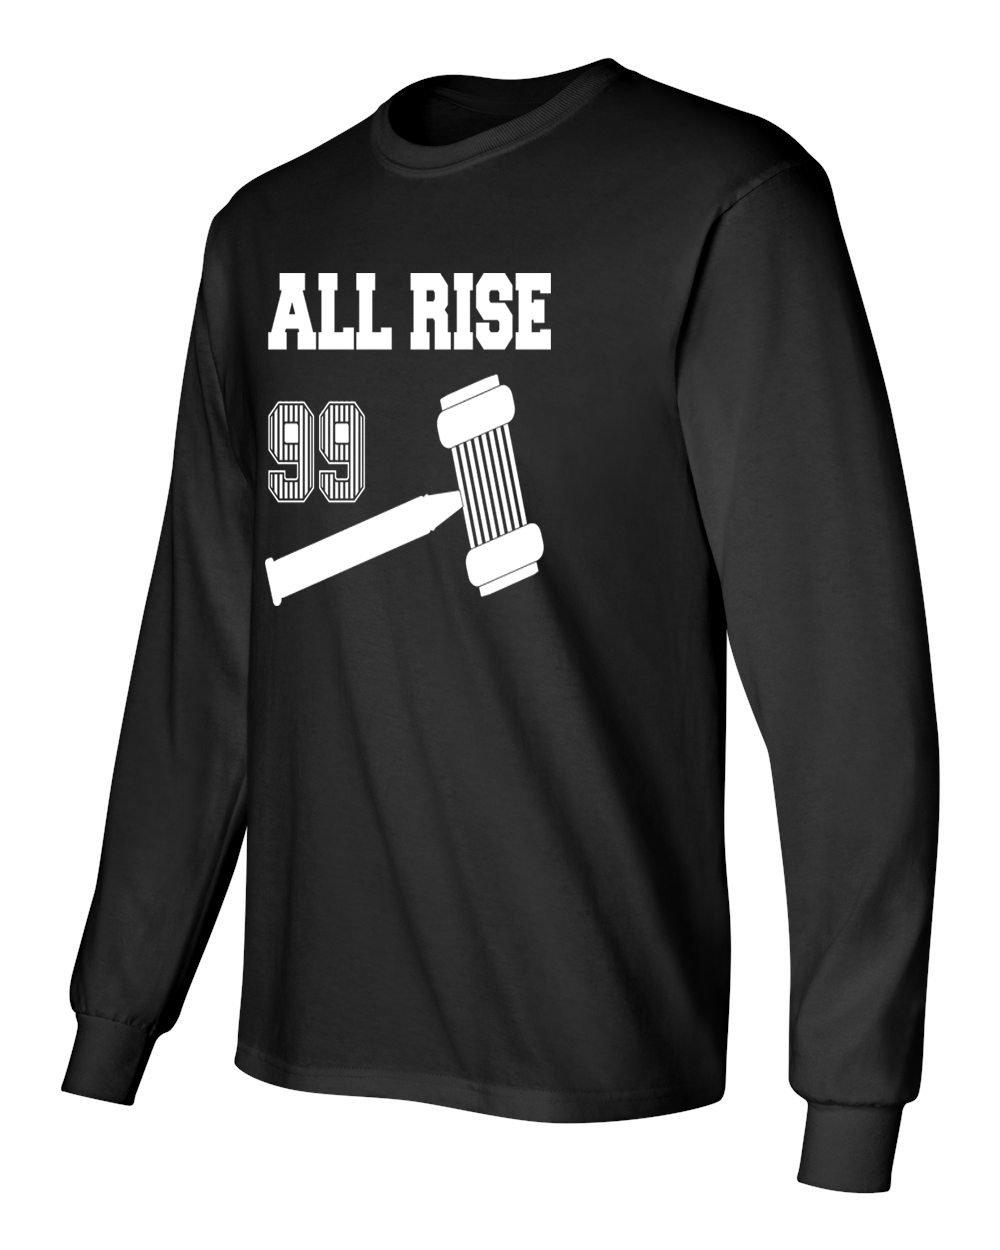 huge discount eea8d ecd75 Amazon.com : KINGS SPORTS Aaron Judge - All Rise T-Shirt ...